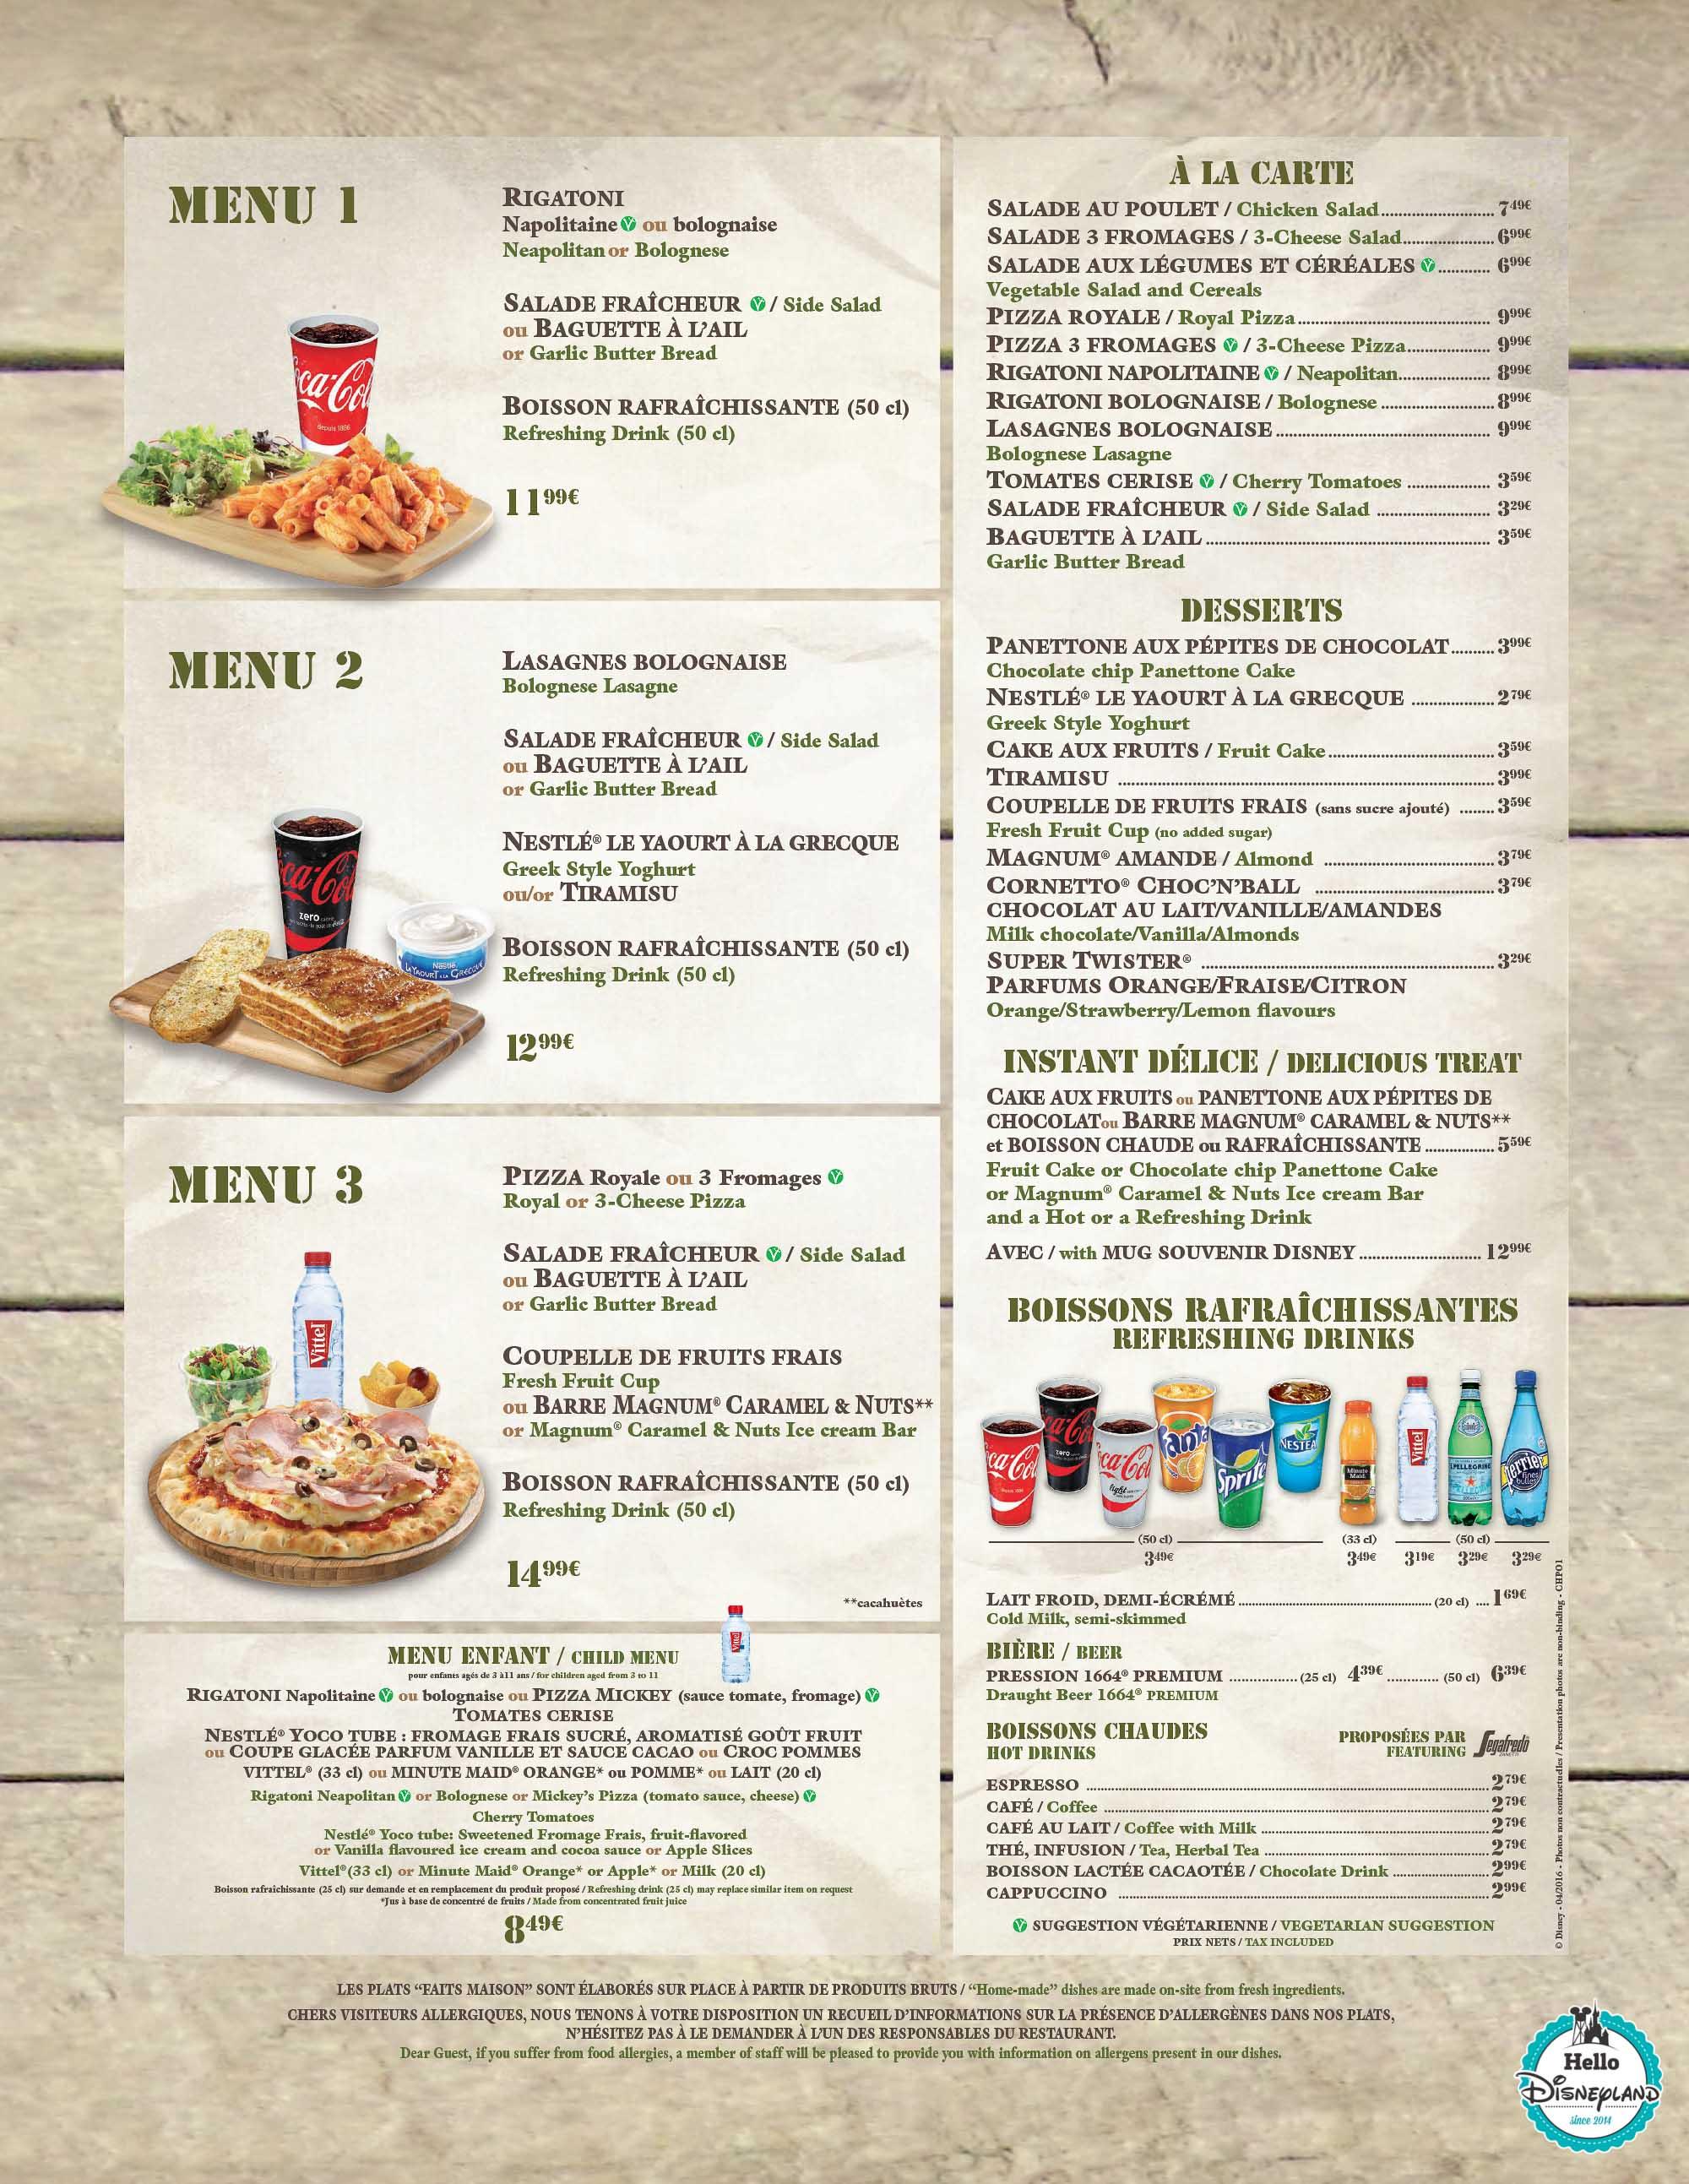 Disneyland-Paris-restaurant-menu-2016-Colonel-Hathi's-avril-2016-1